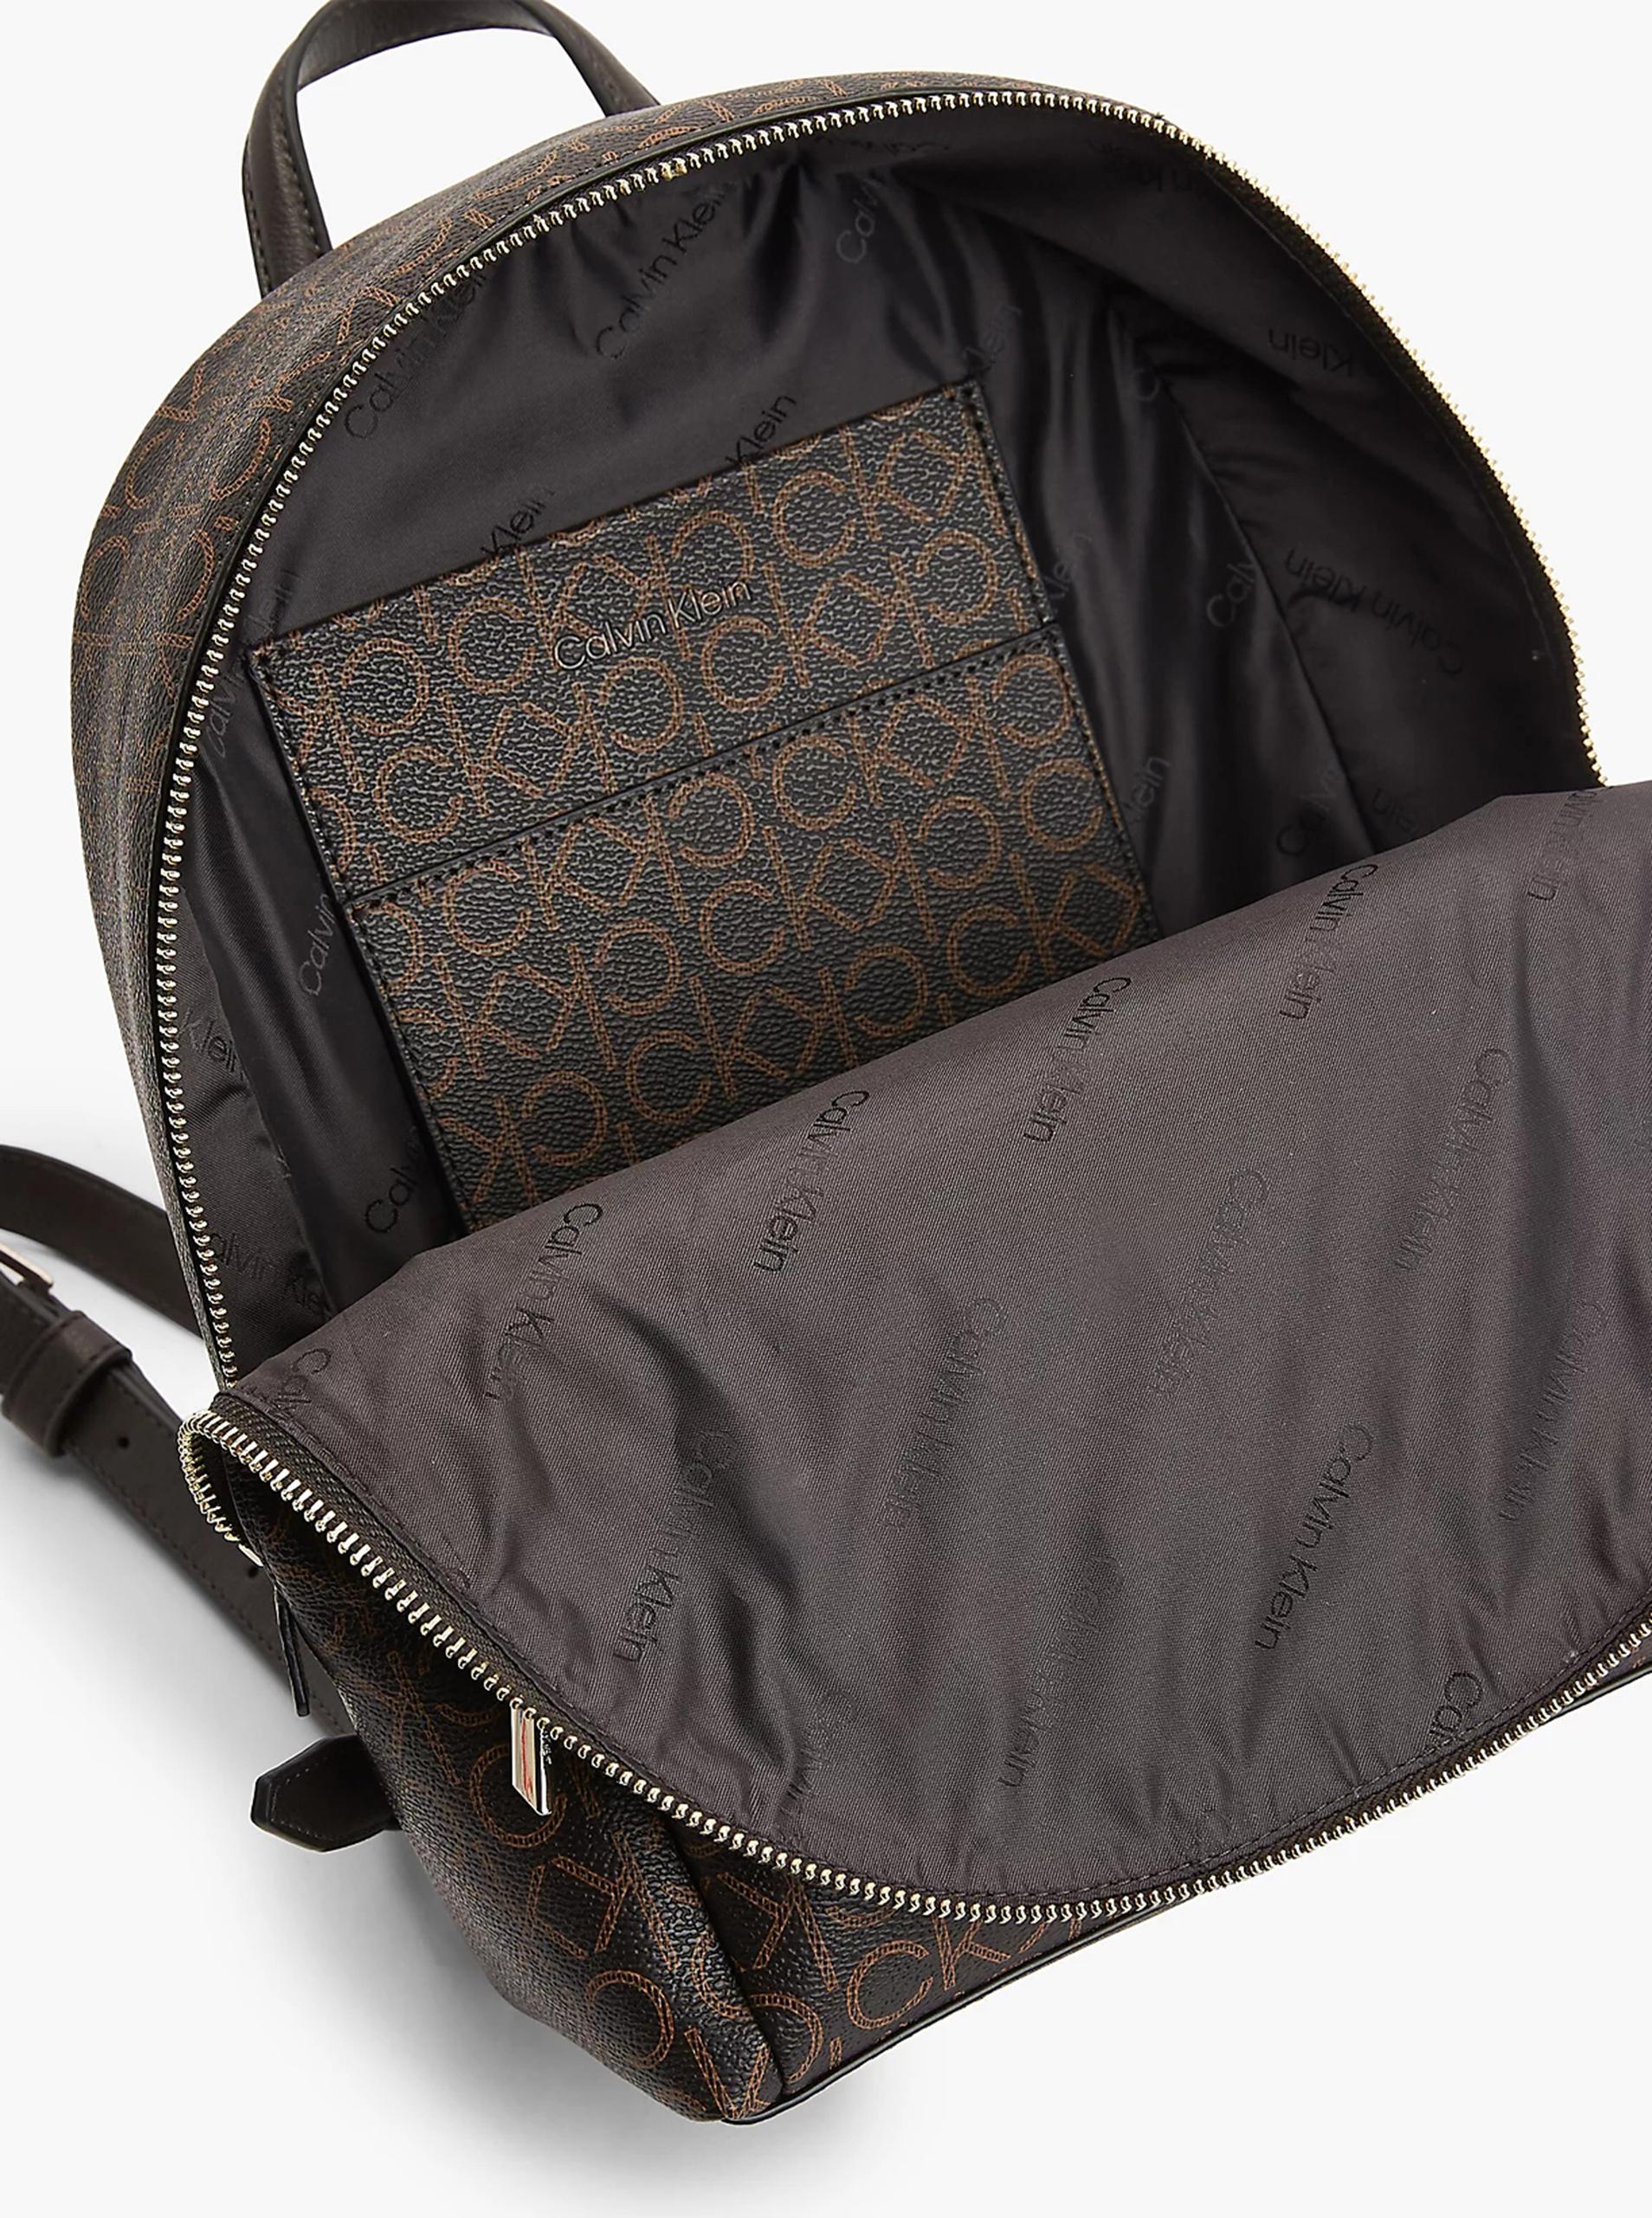 Calvin Klein brązowy plecak